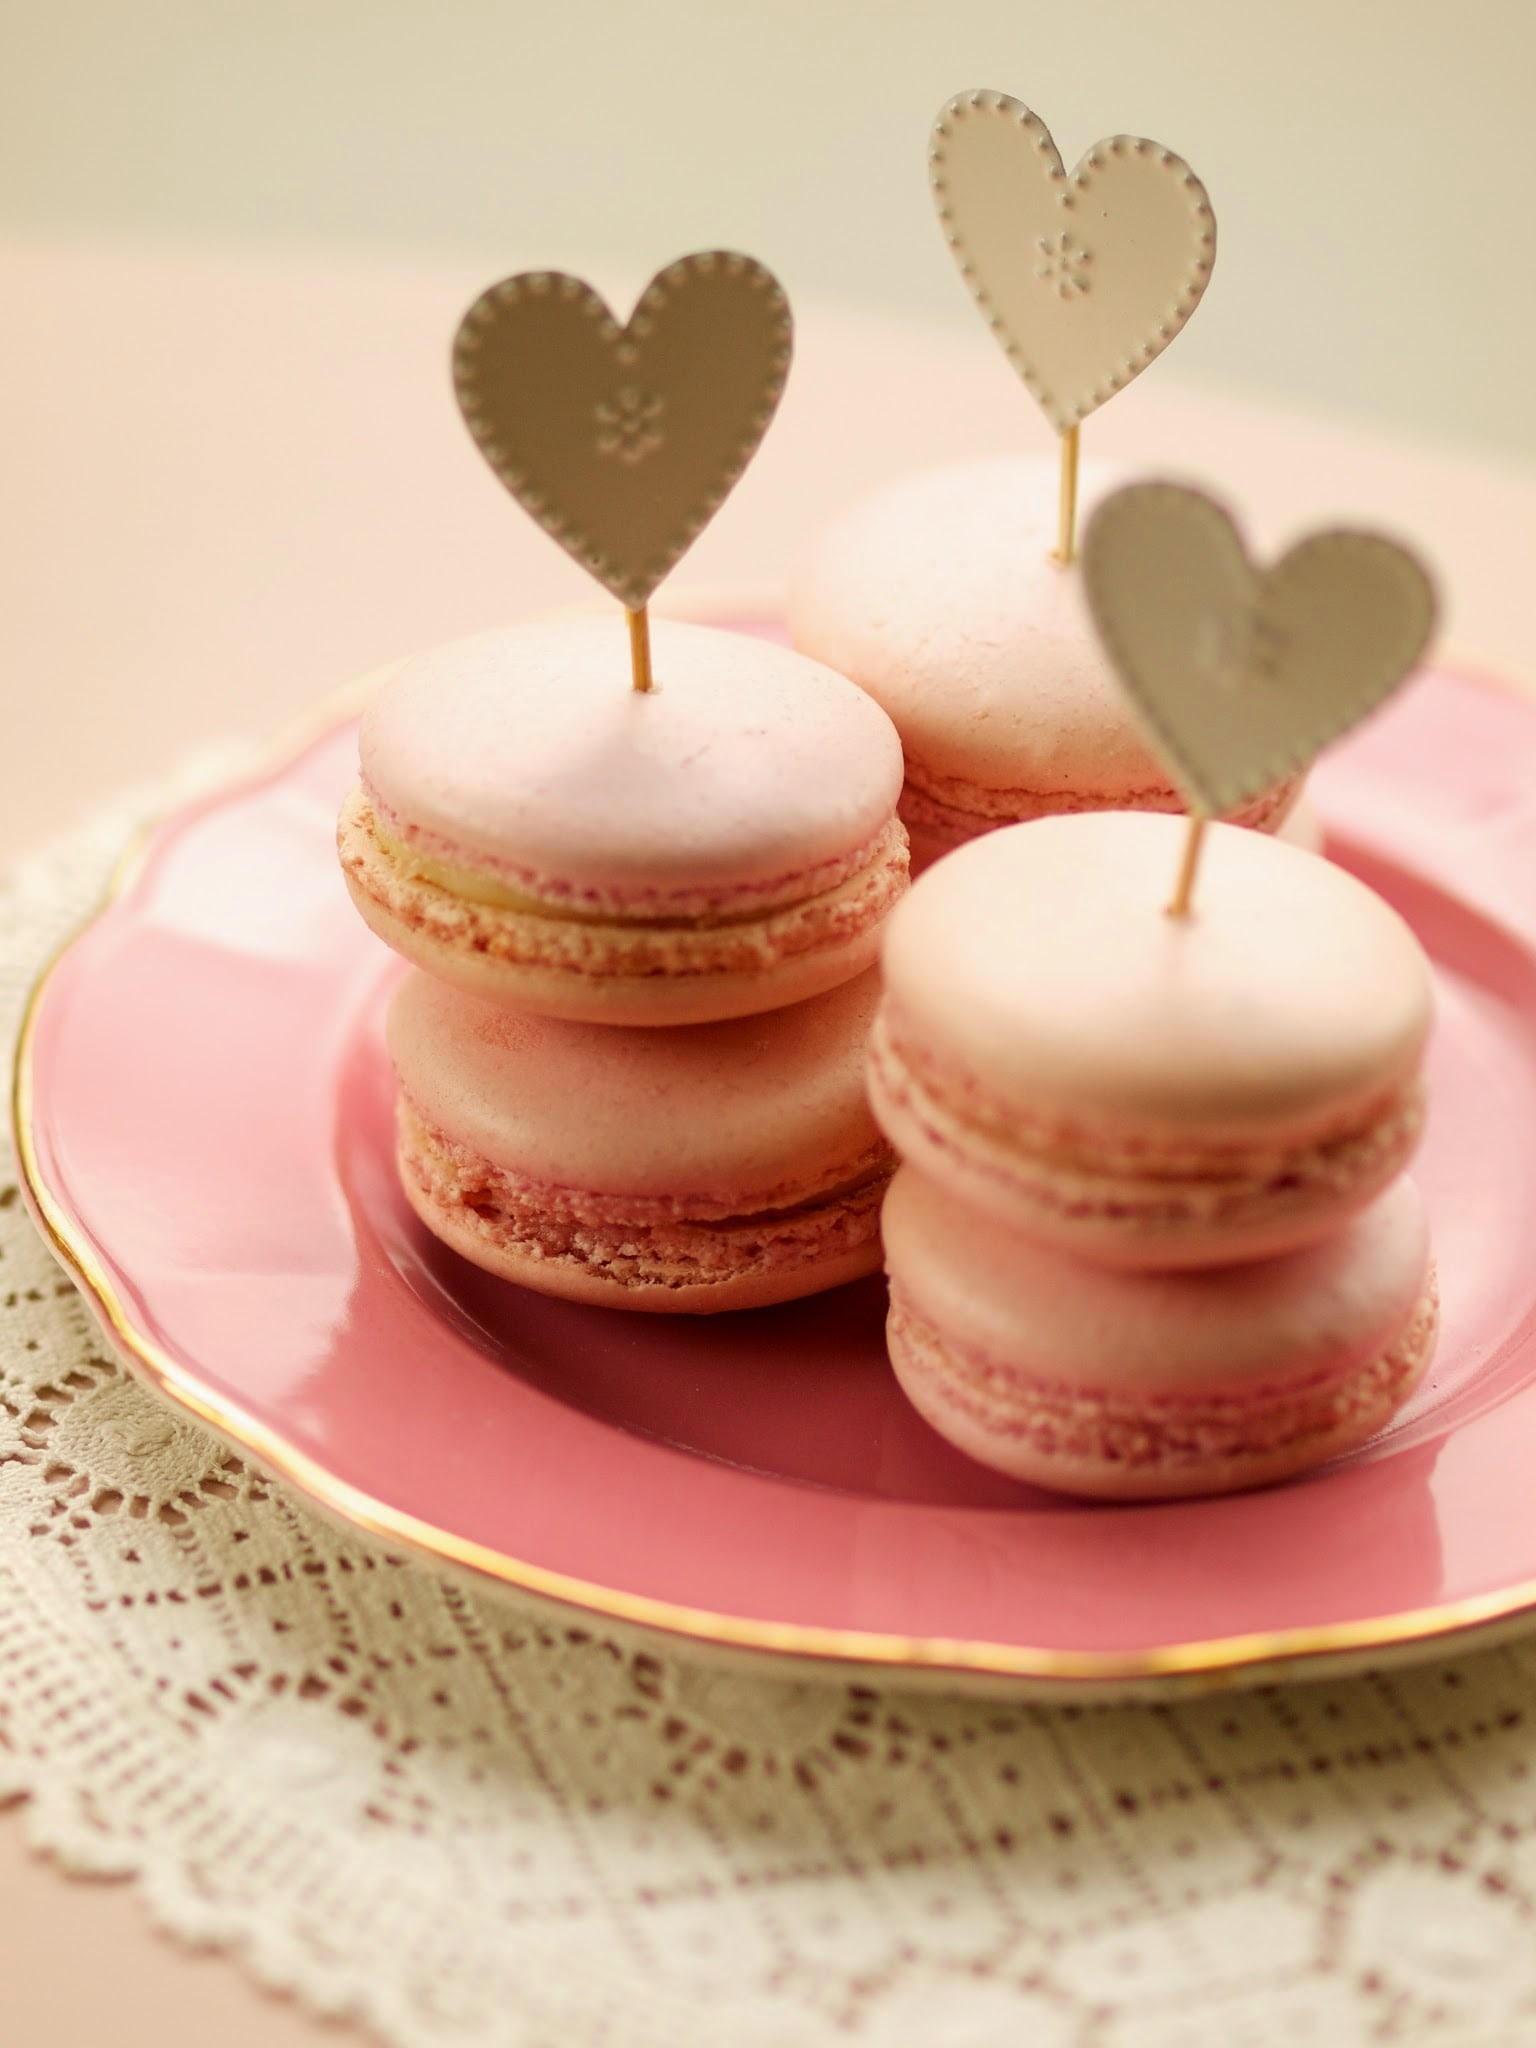 sobremesa-rosa-cha-de-panela-macaron-04-min